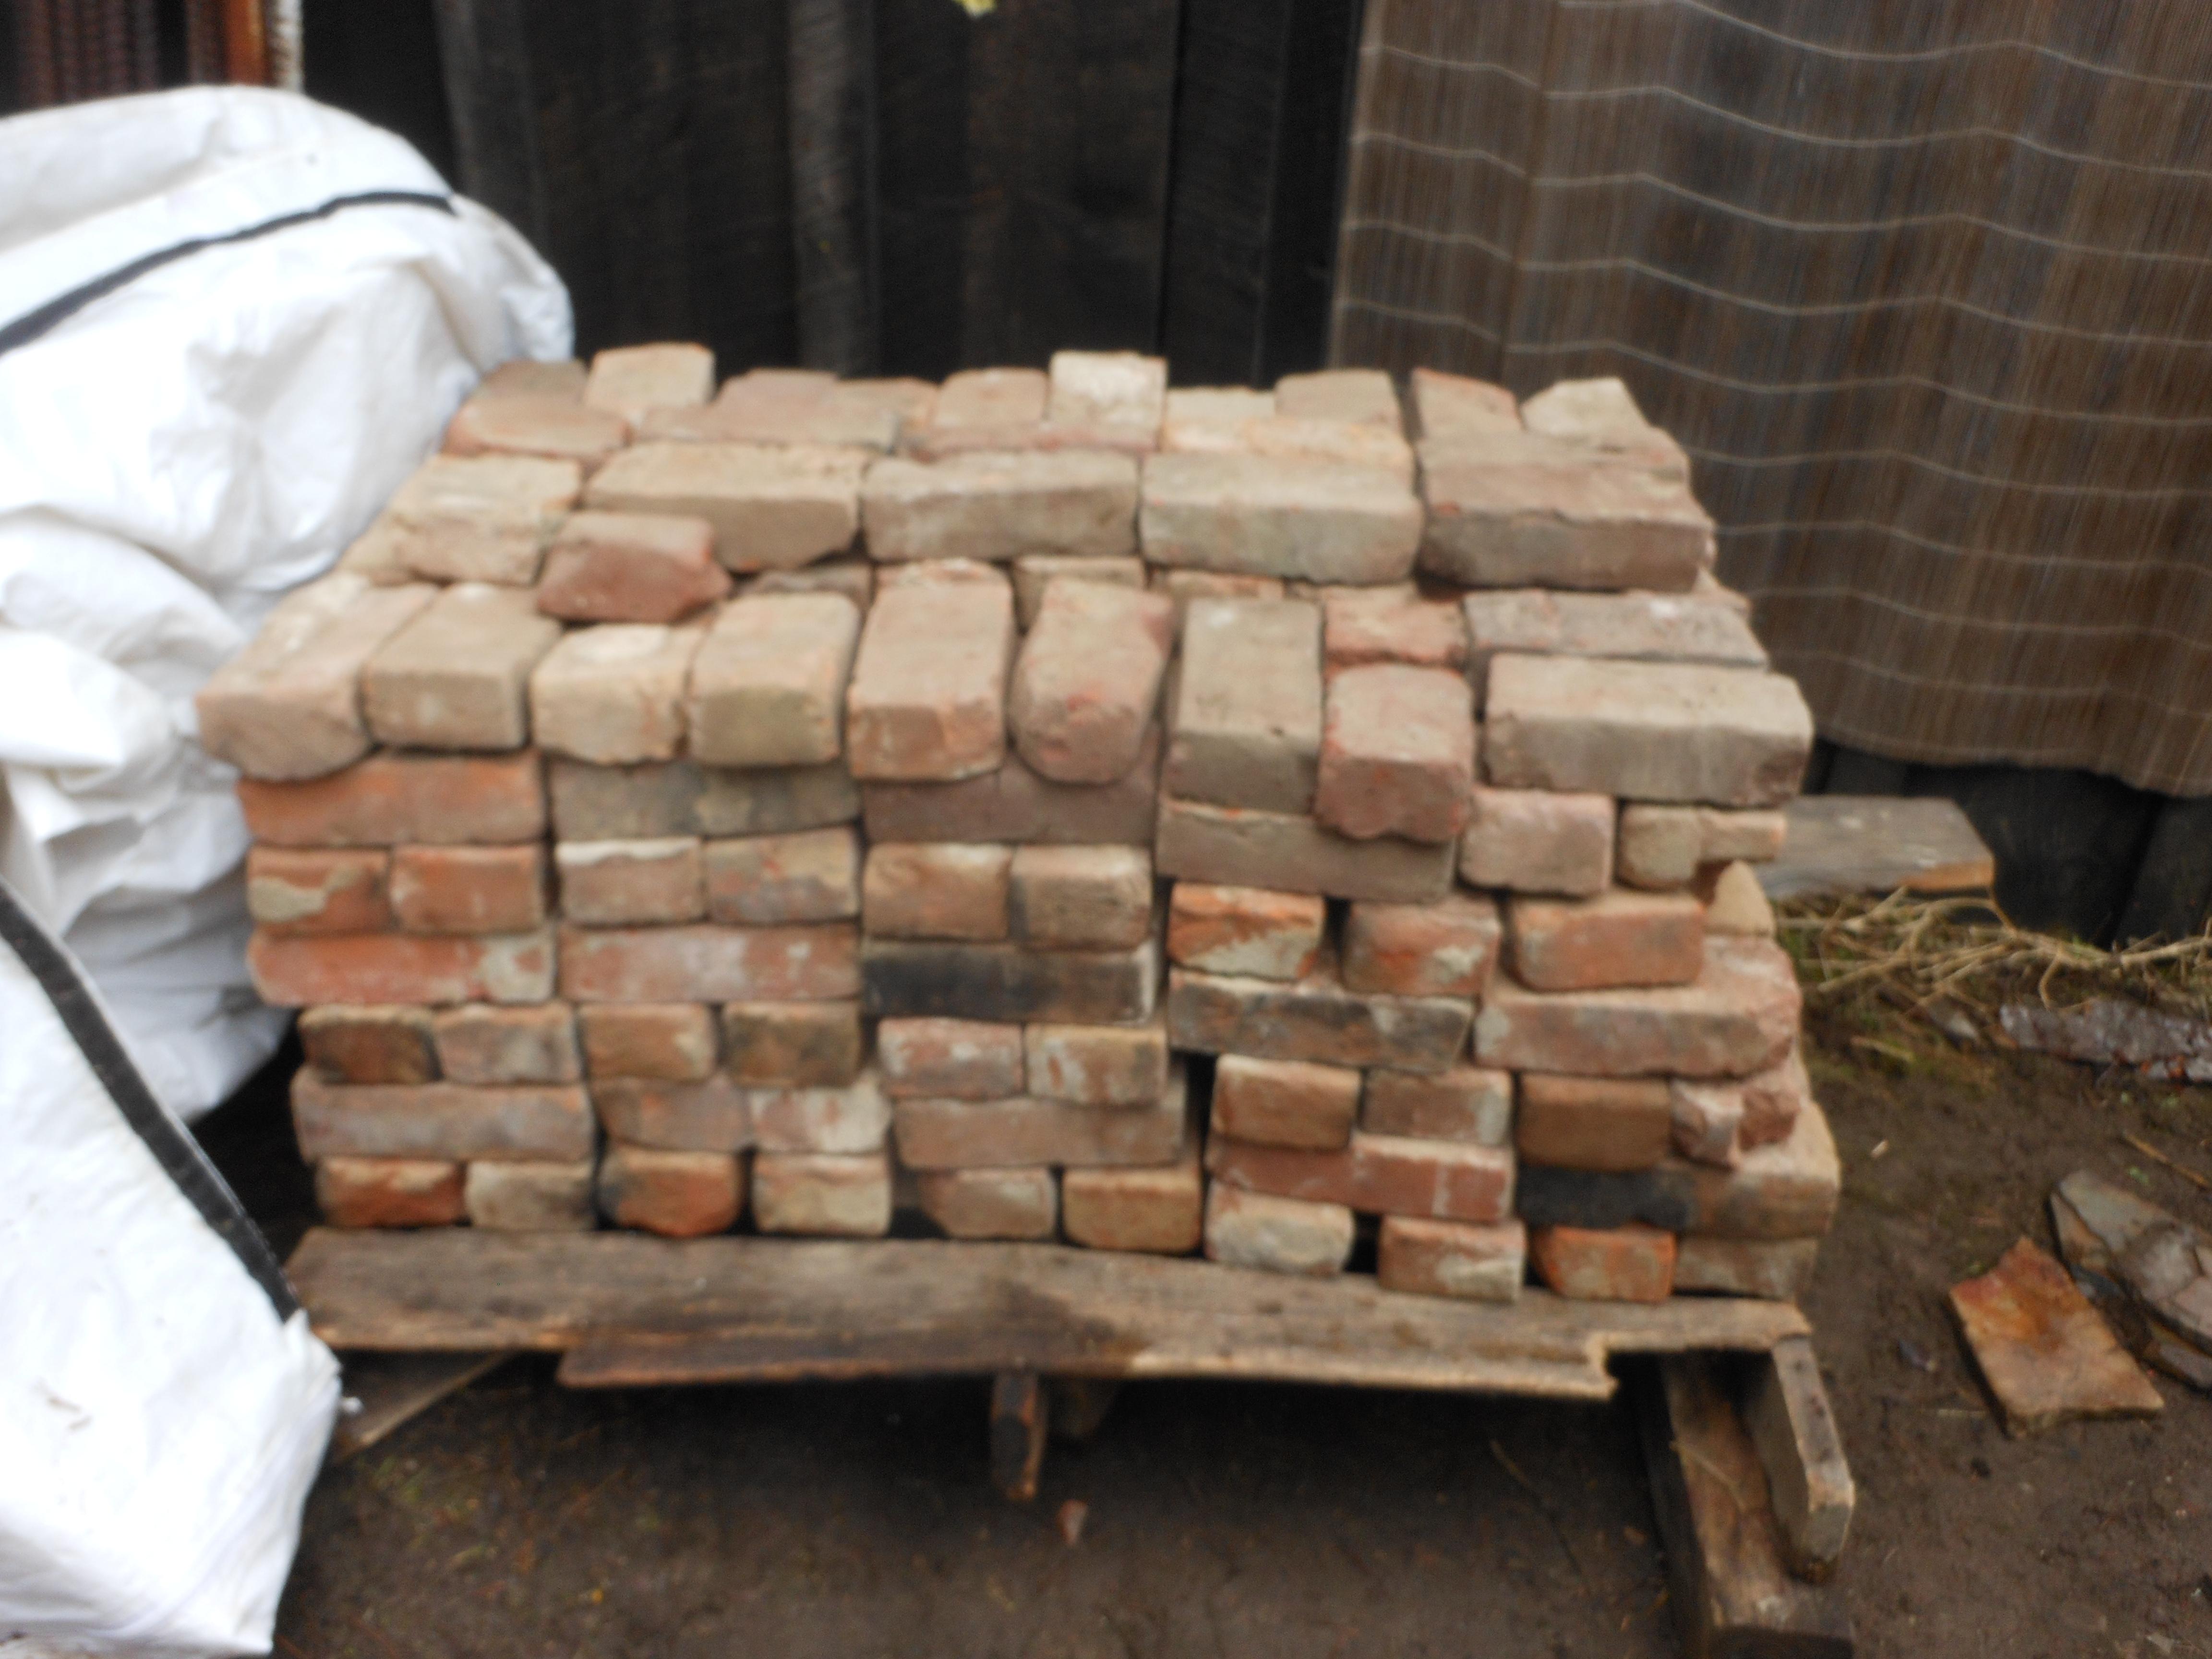 Bricks For Sale >> Yard Sale Red Clay Bricks Stone Work Forum At Permies